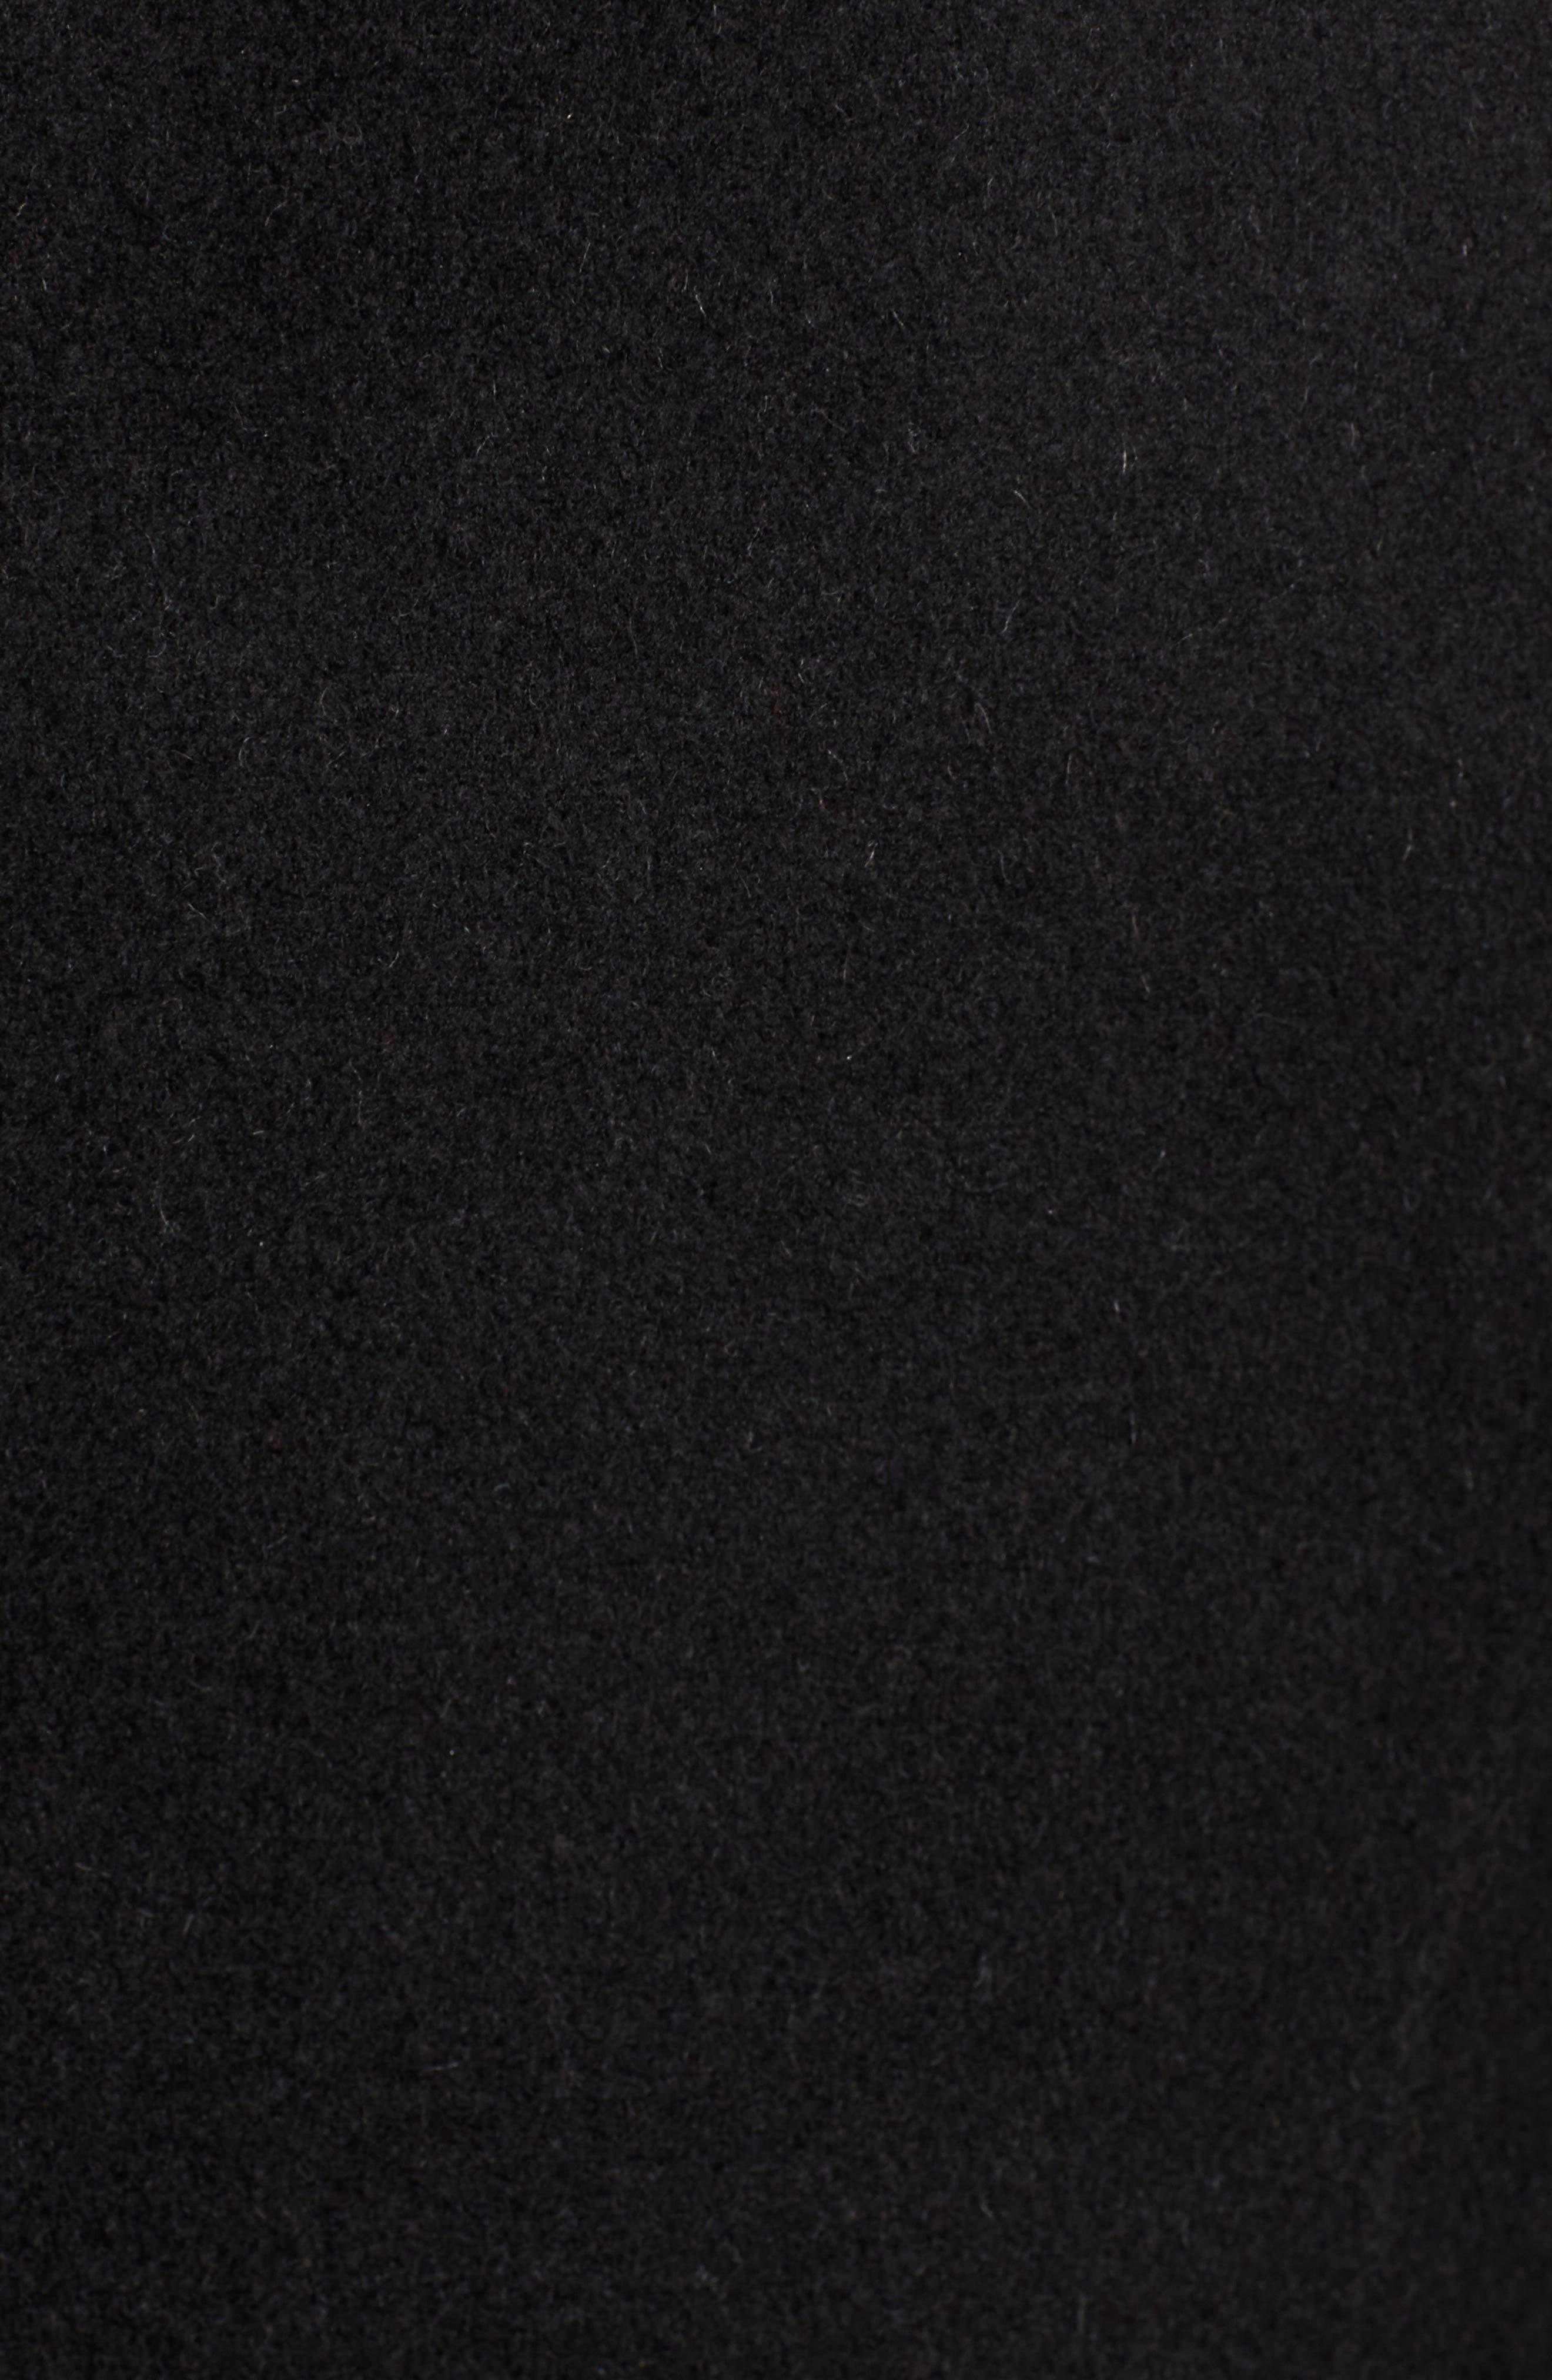 Vane Asymmetrical Leather Sleeve Coat,                             Alternate thumbnail 7, color,                             BLACK/ CHARCOAL